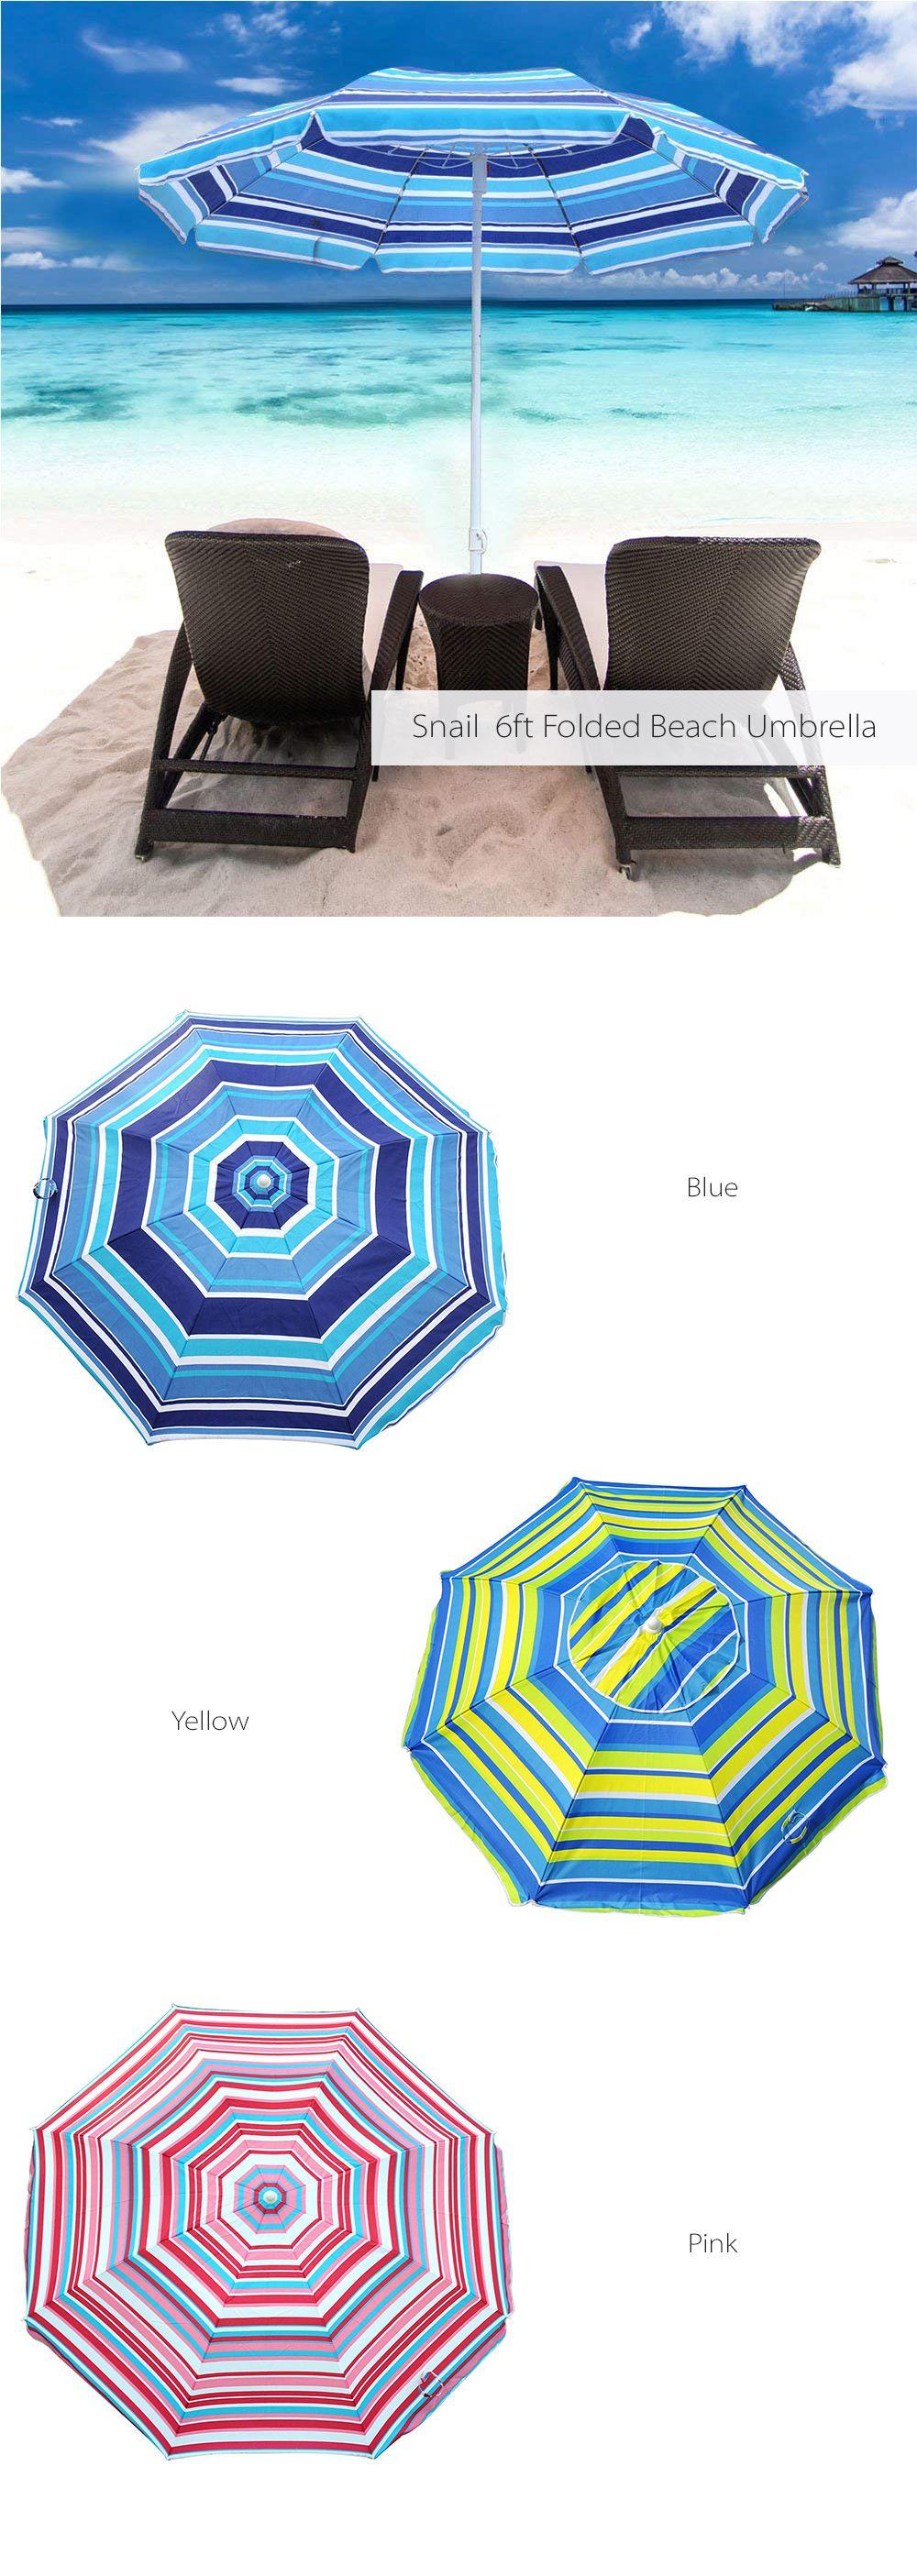 Snail 6ft Folded Beach Umbrella UV Protection Stripe